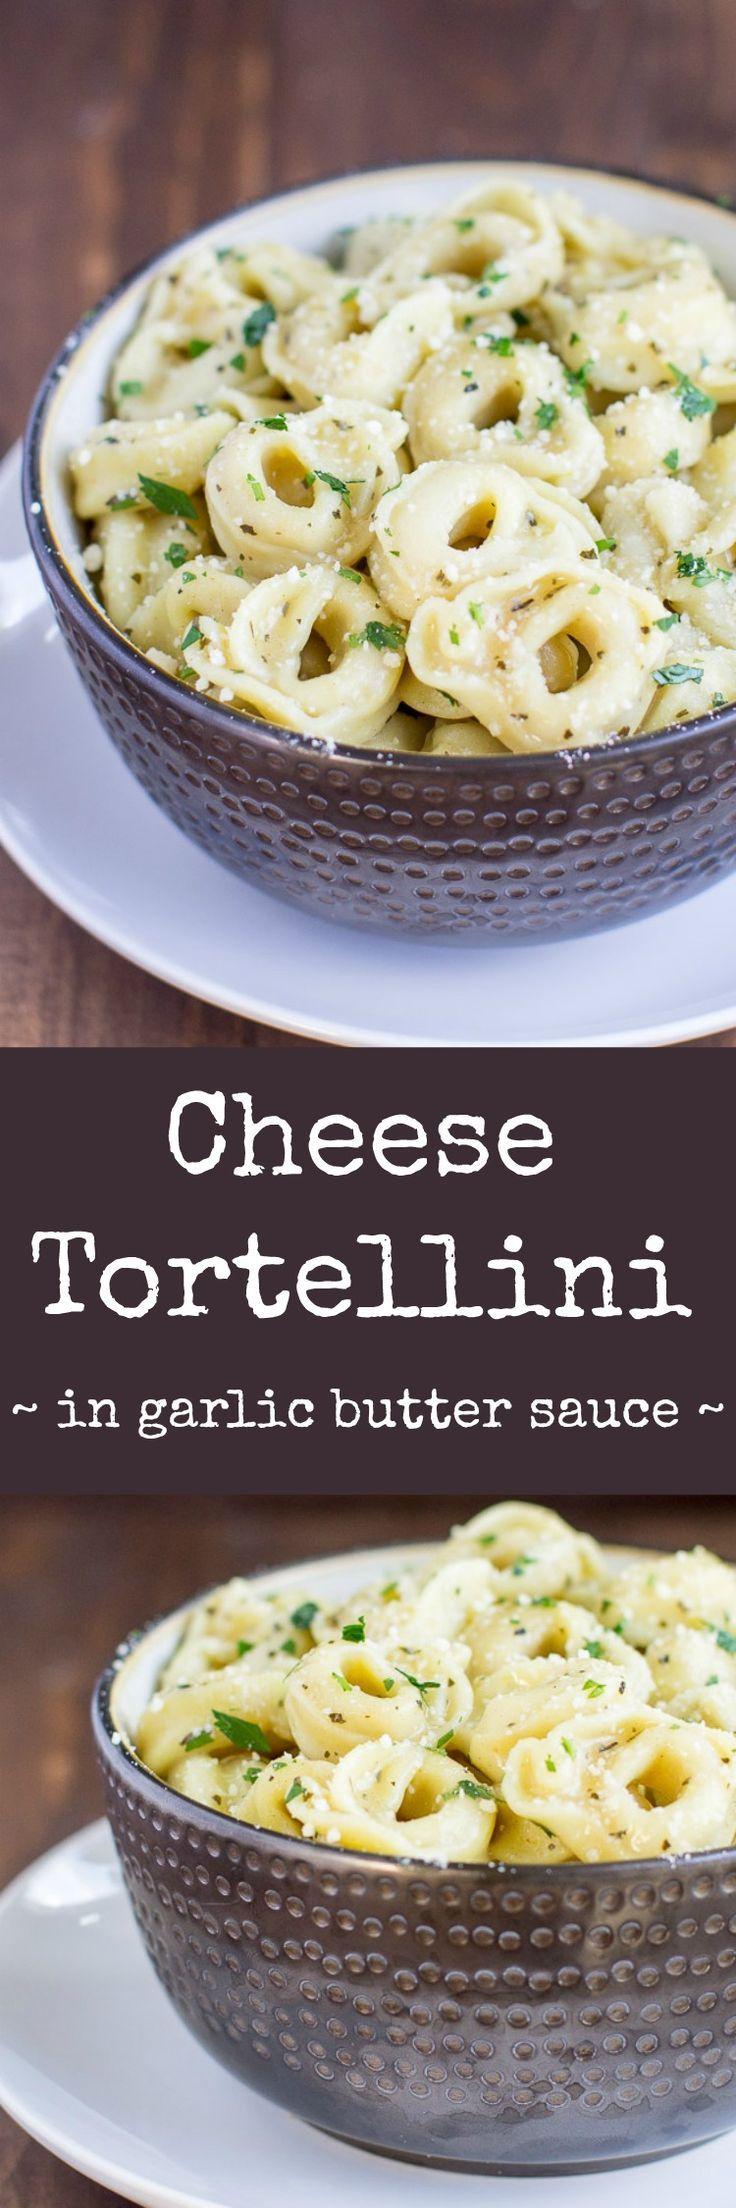 Tortellini sauce recipes easy